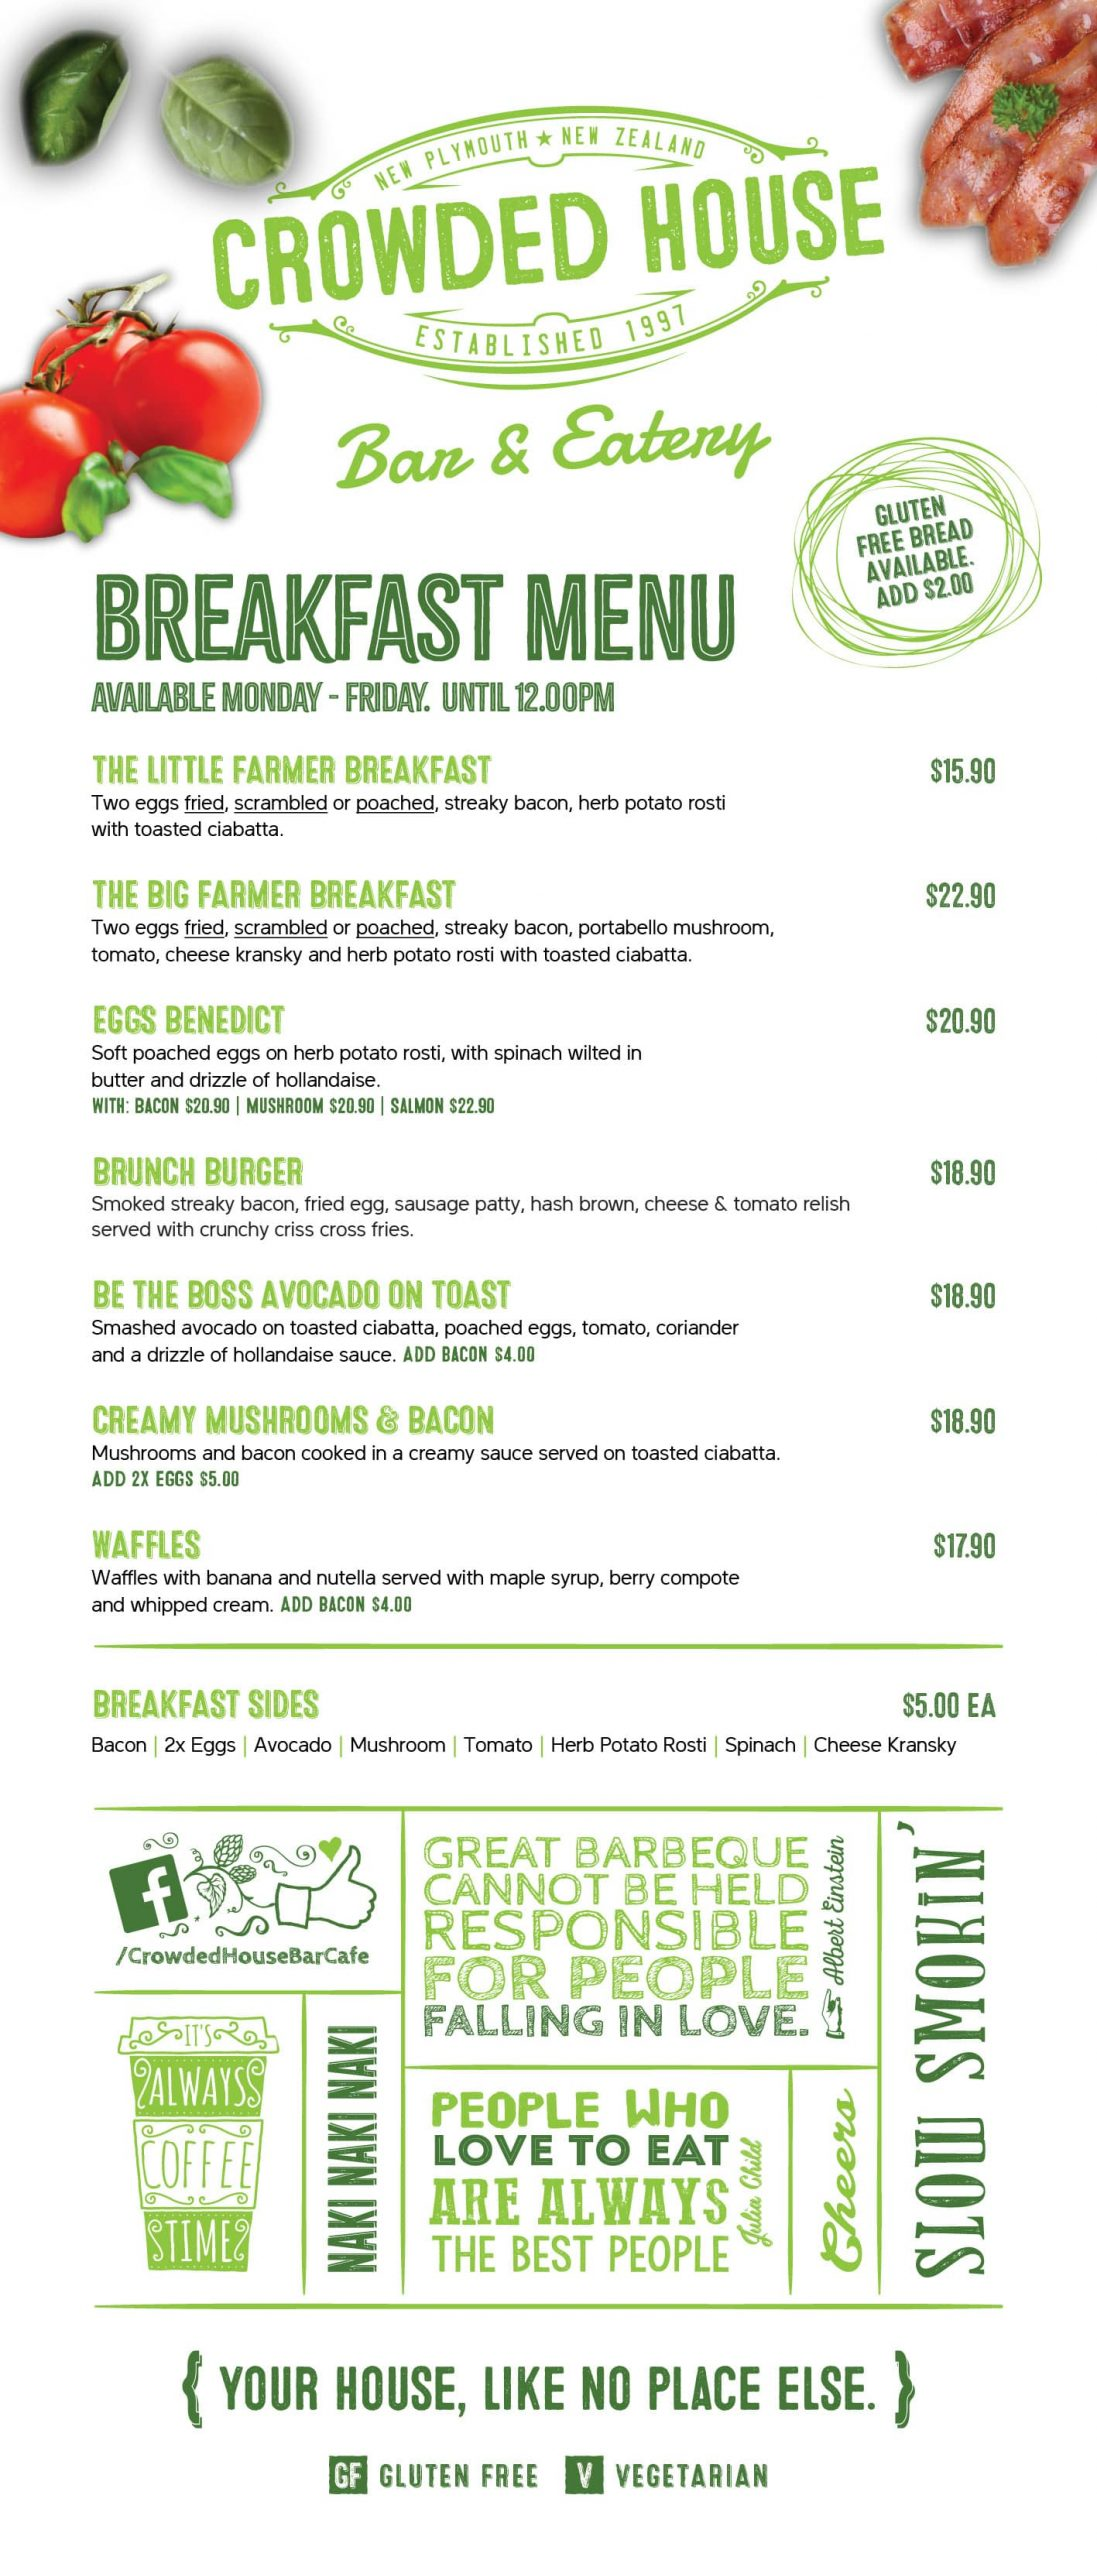 CROWDED-HOUSE_Breakfast-Express-Menu_Oct2020